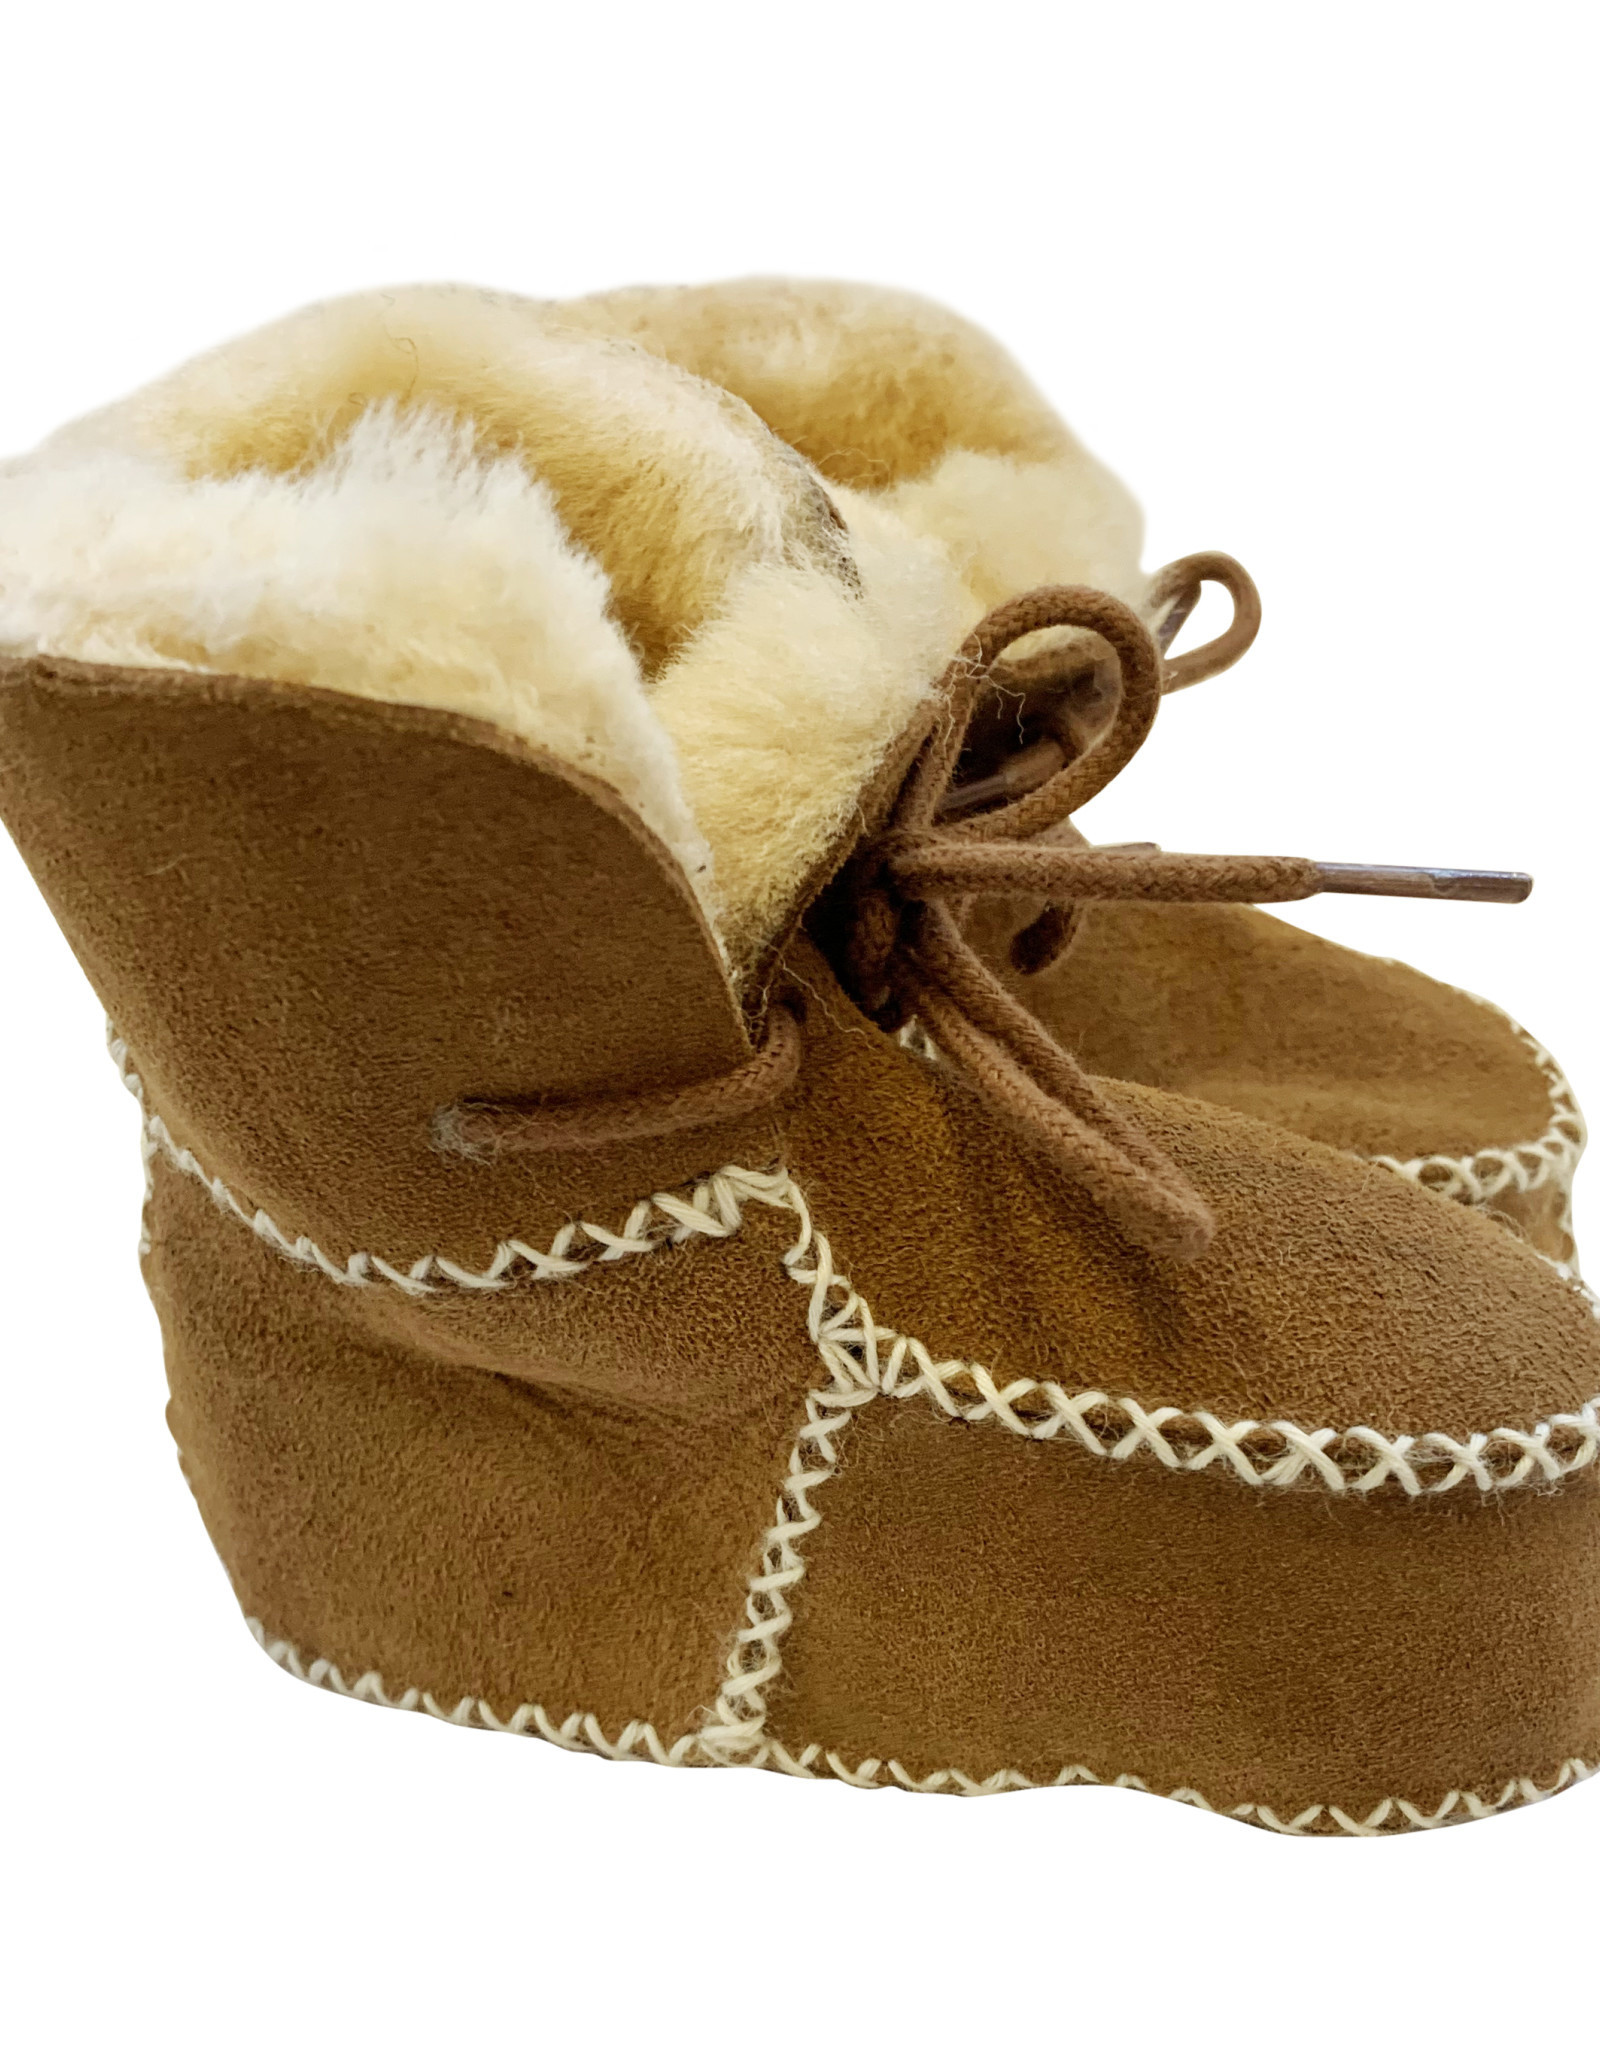 The Simple Folk The Sheepskin Bootie - Tan